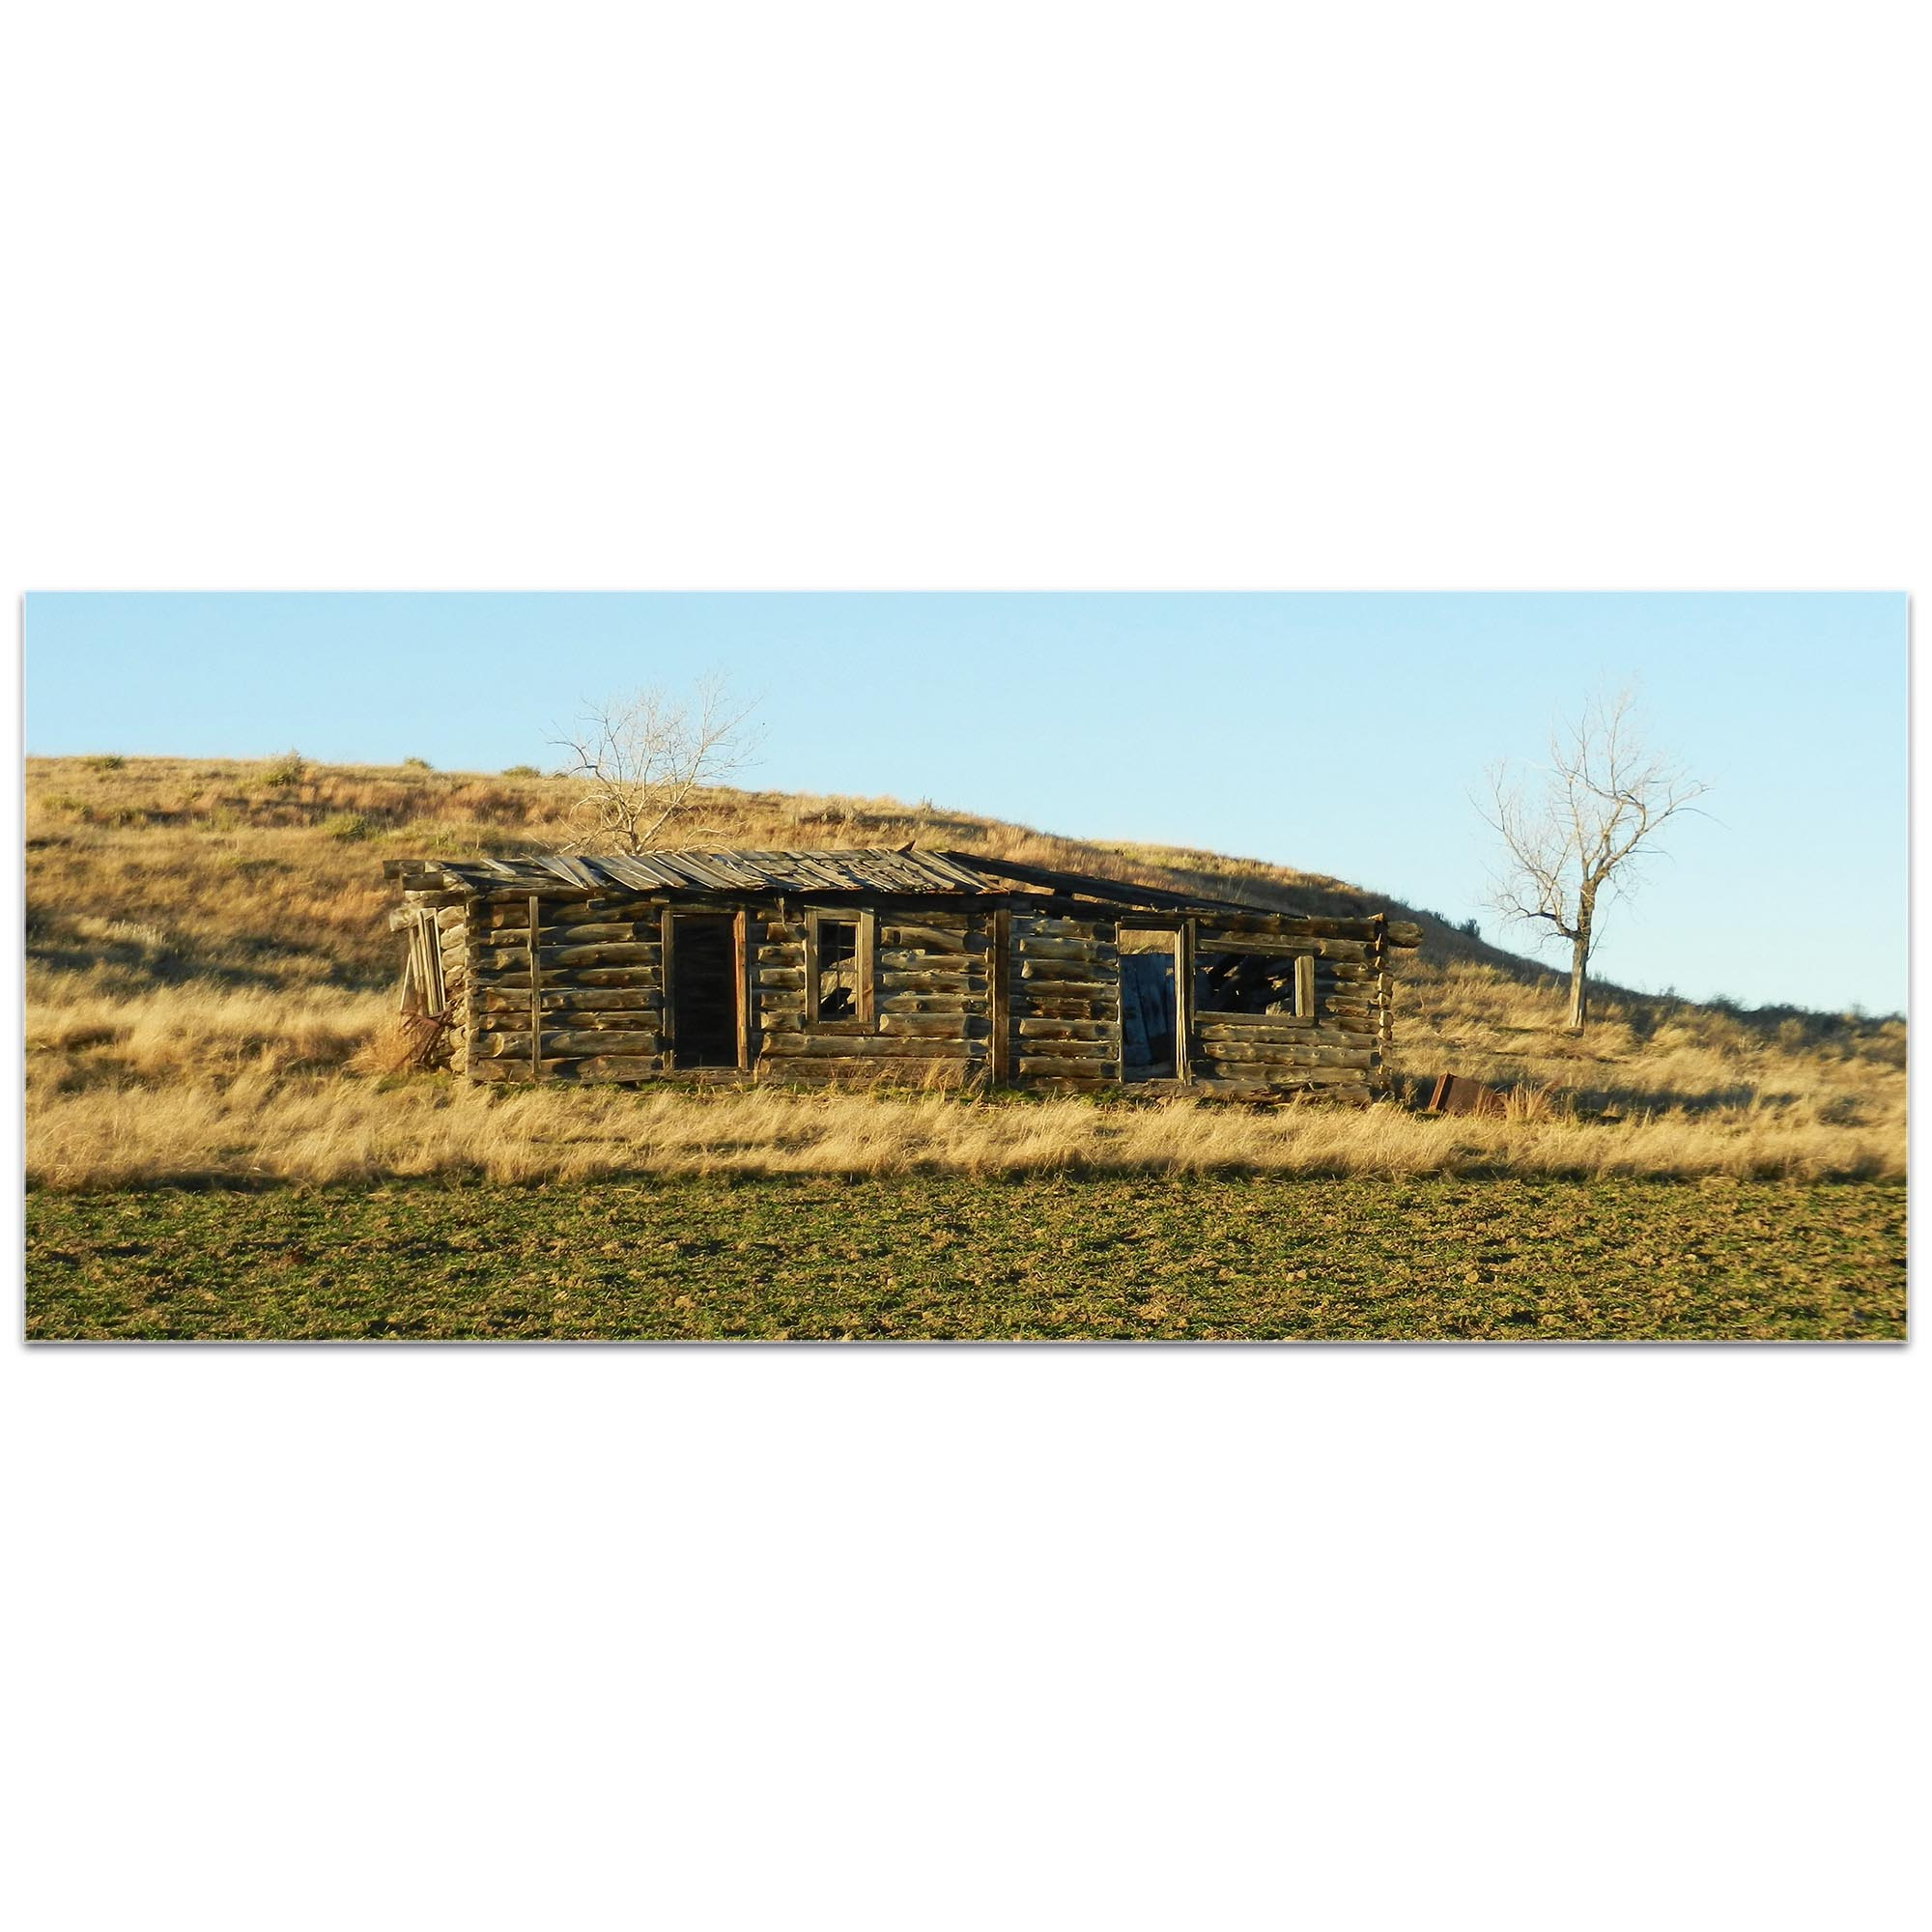 Western Wall Art 'The Hillside' - American West Decor on Metal or Plexiglass - Image 2